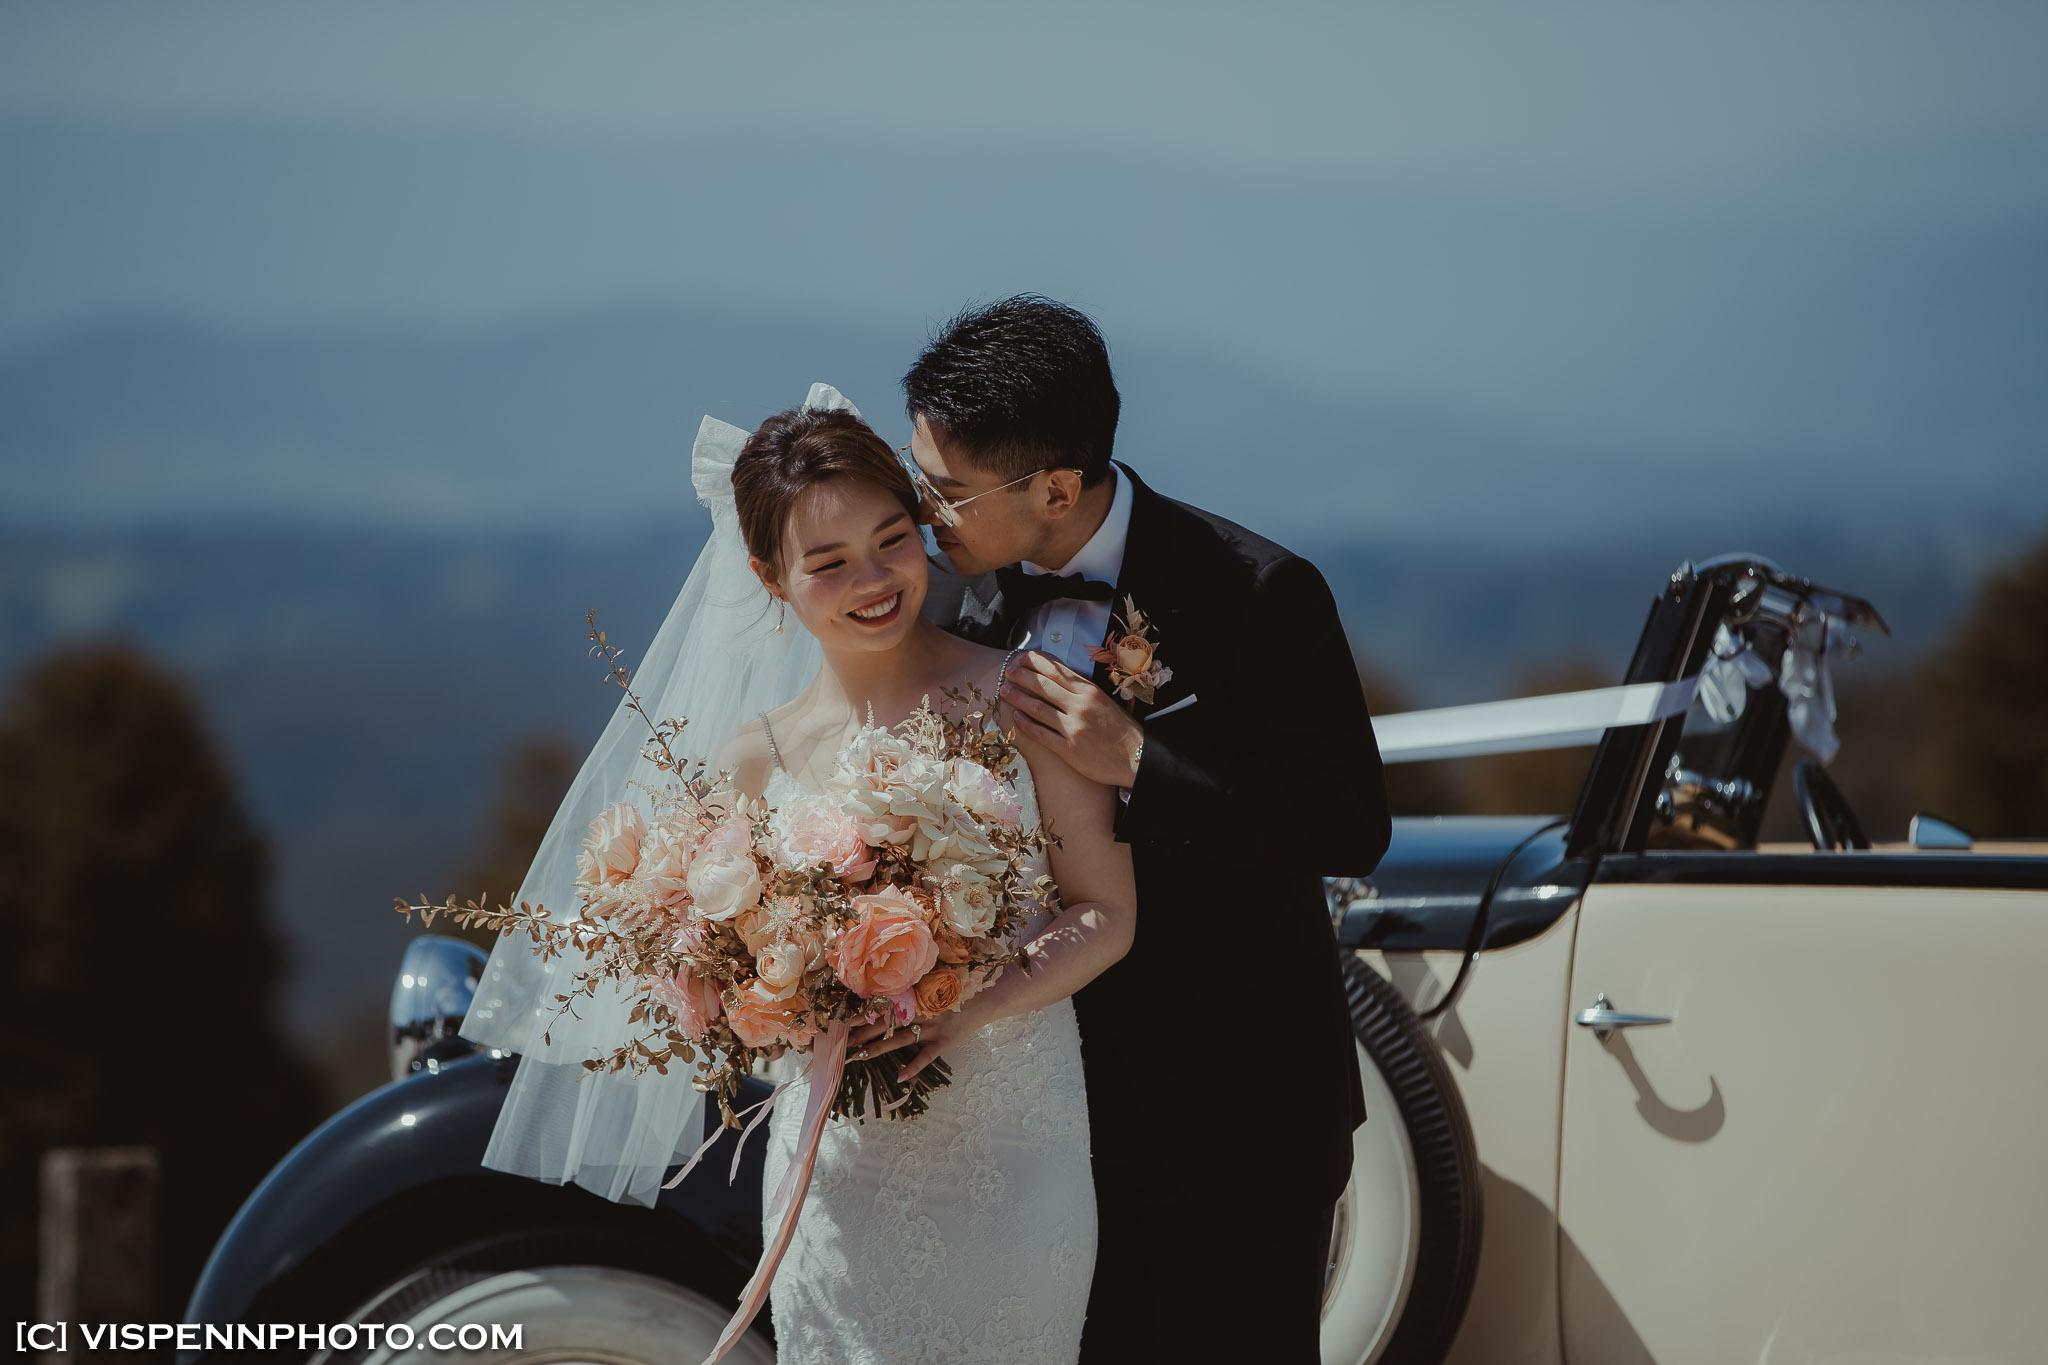 WEDDING DAY Photography Melbourne VISPENN 墨尔本 婚礼跟拍 婚礼摄像 婚礼摄影 结婚照 登记照 ElitaPB 06212 2P 1DX2 VISPENN